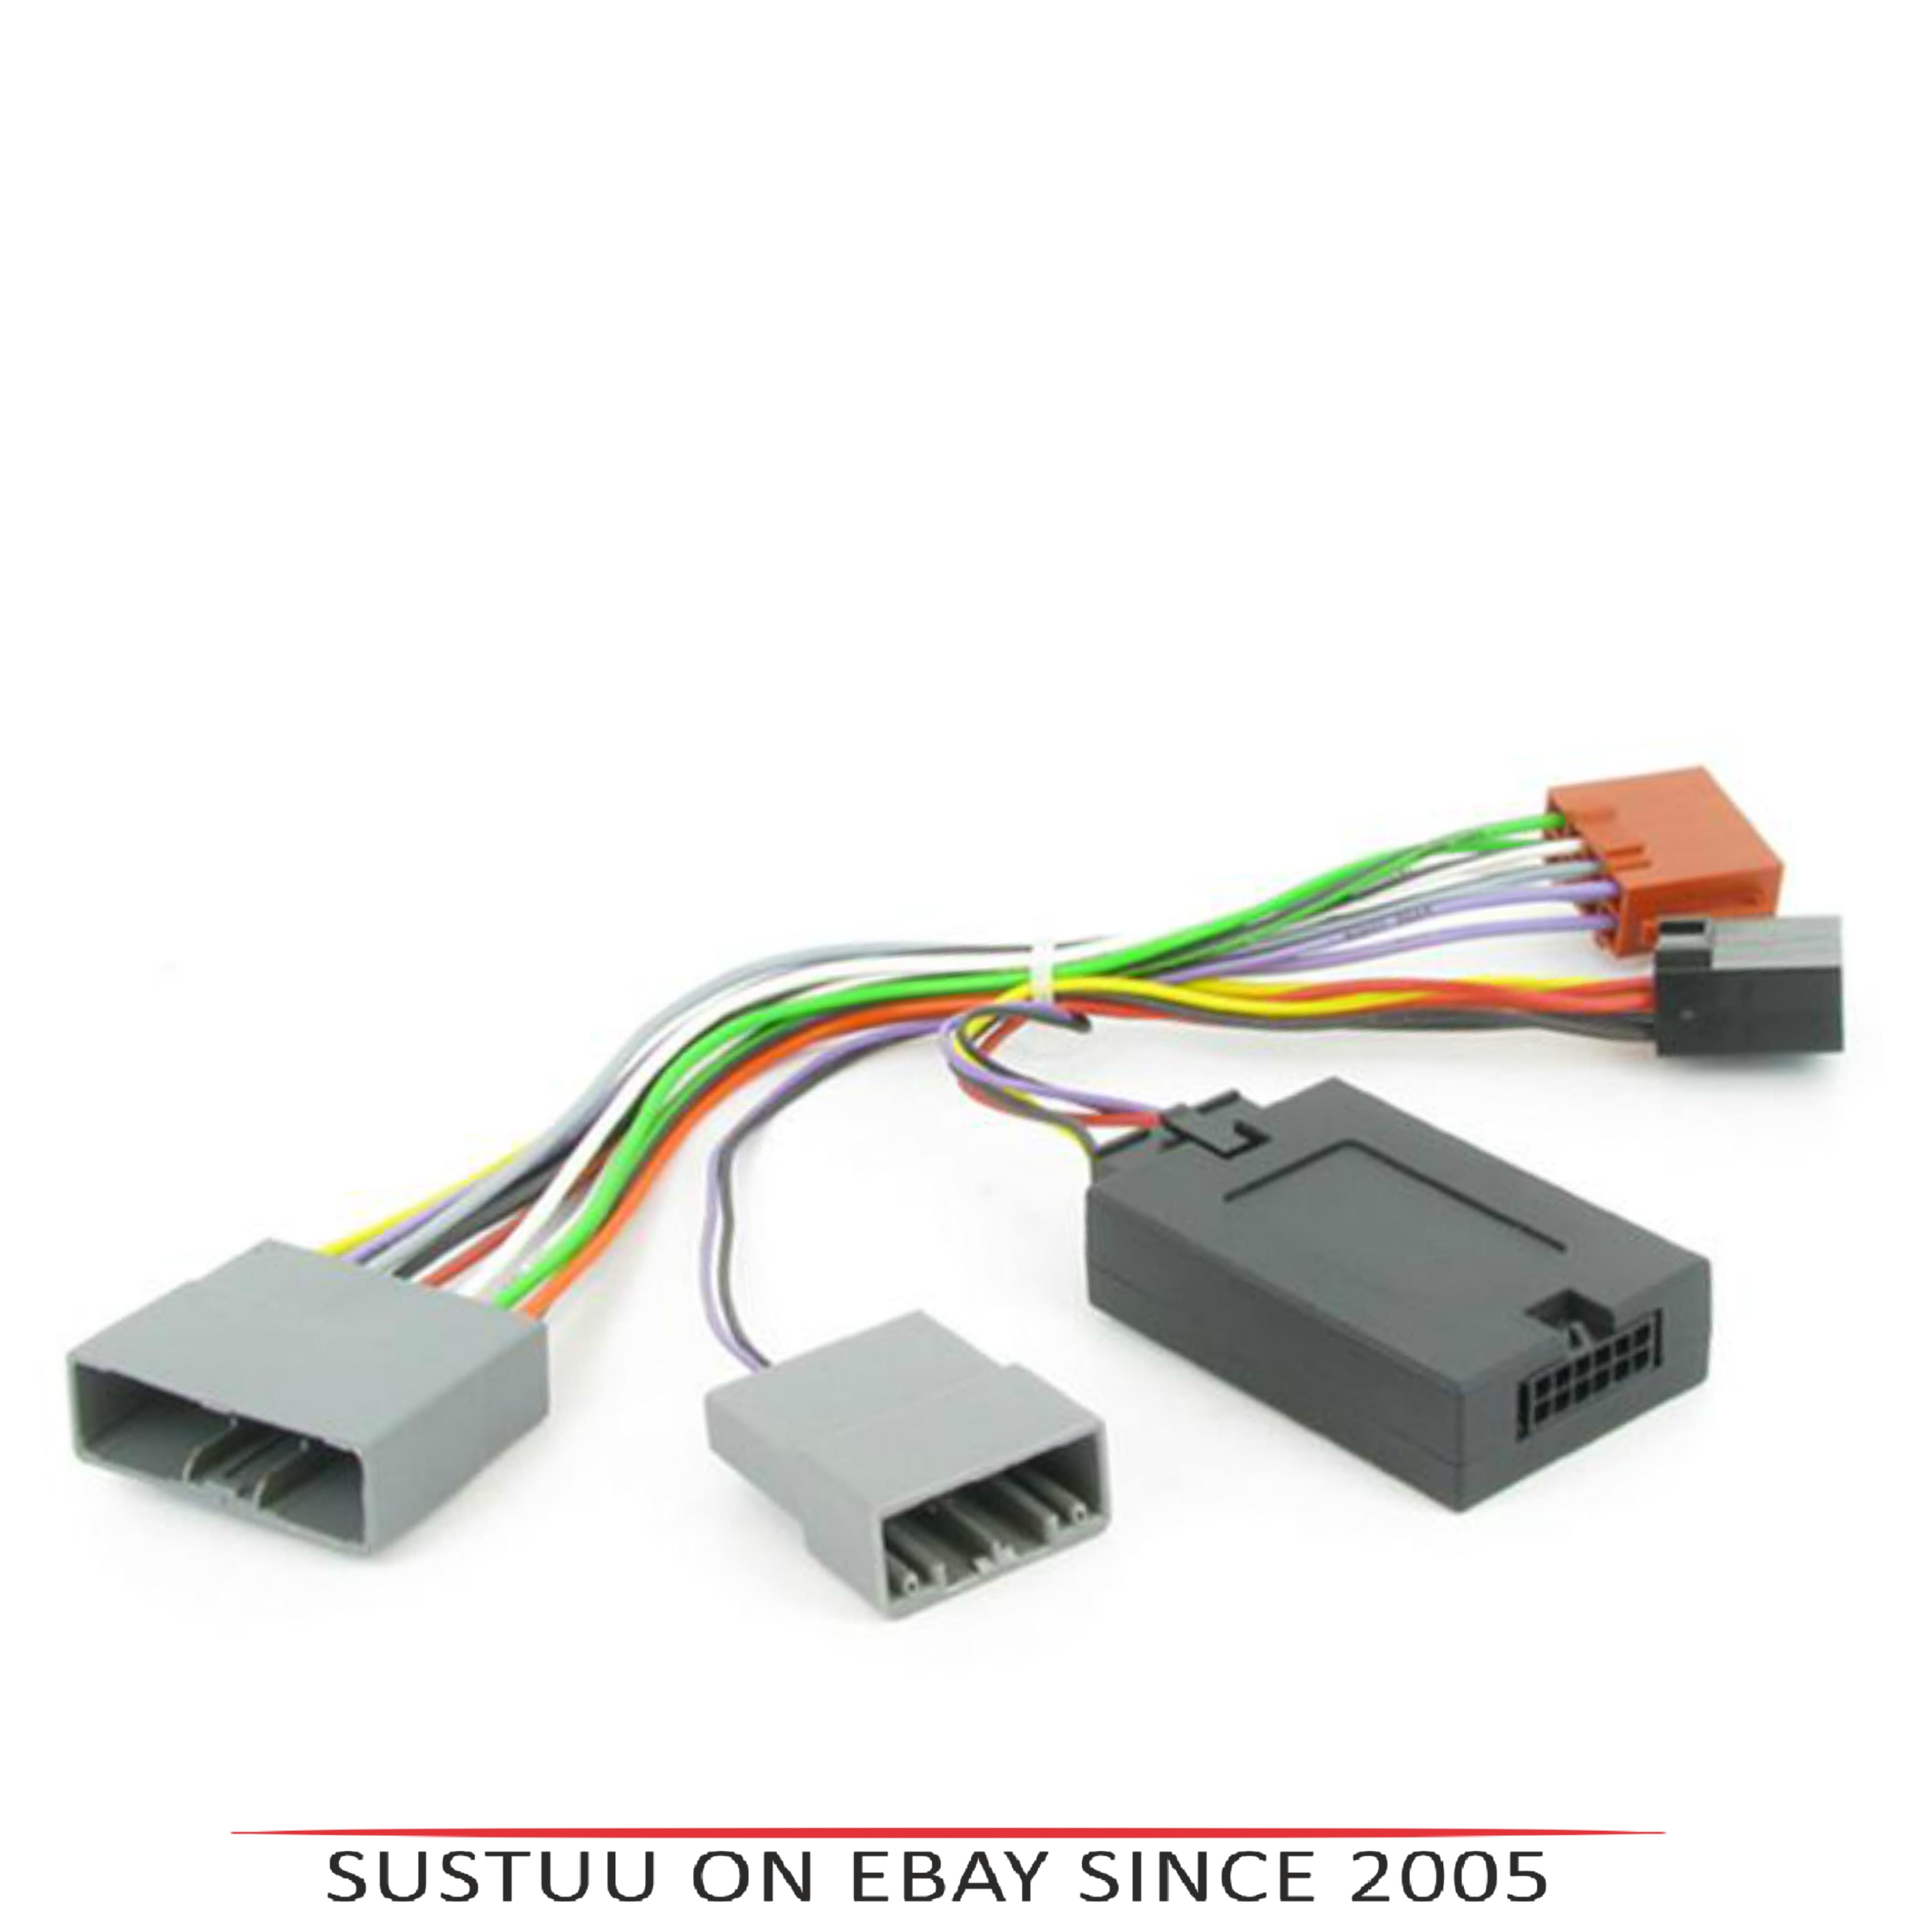 C2 SFO004|Electric Stalk Control Interface Car Accessory|Ford FIESTA 2008-2010